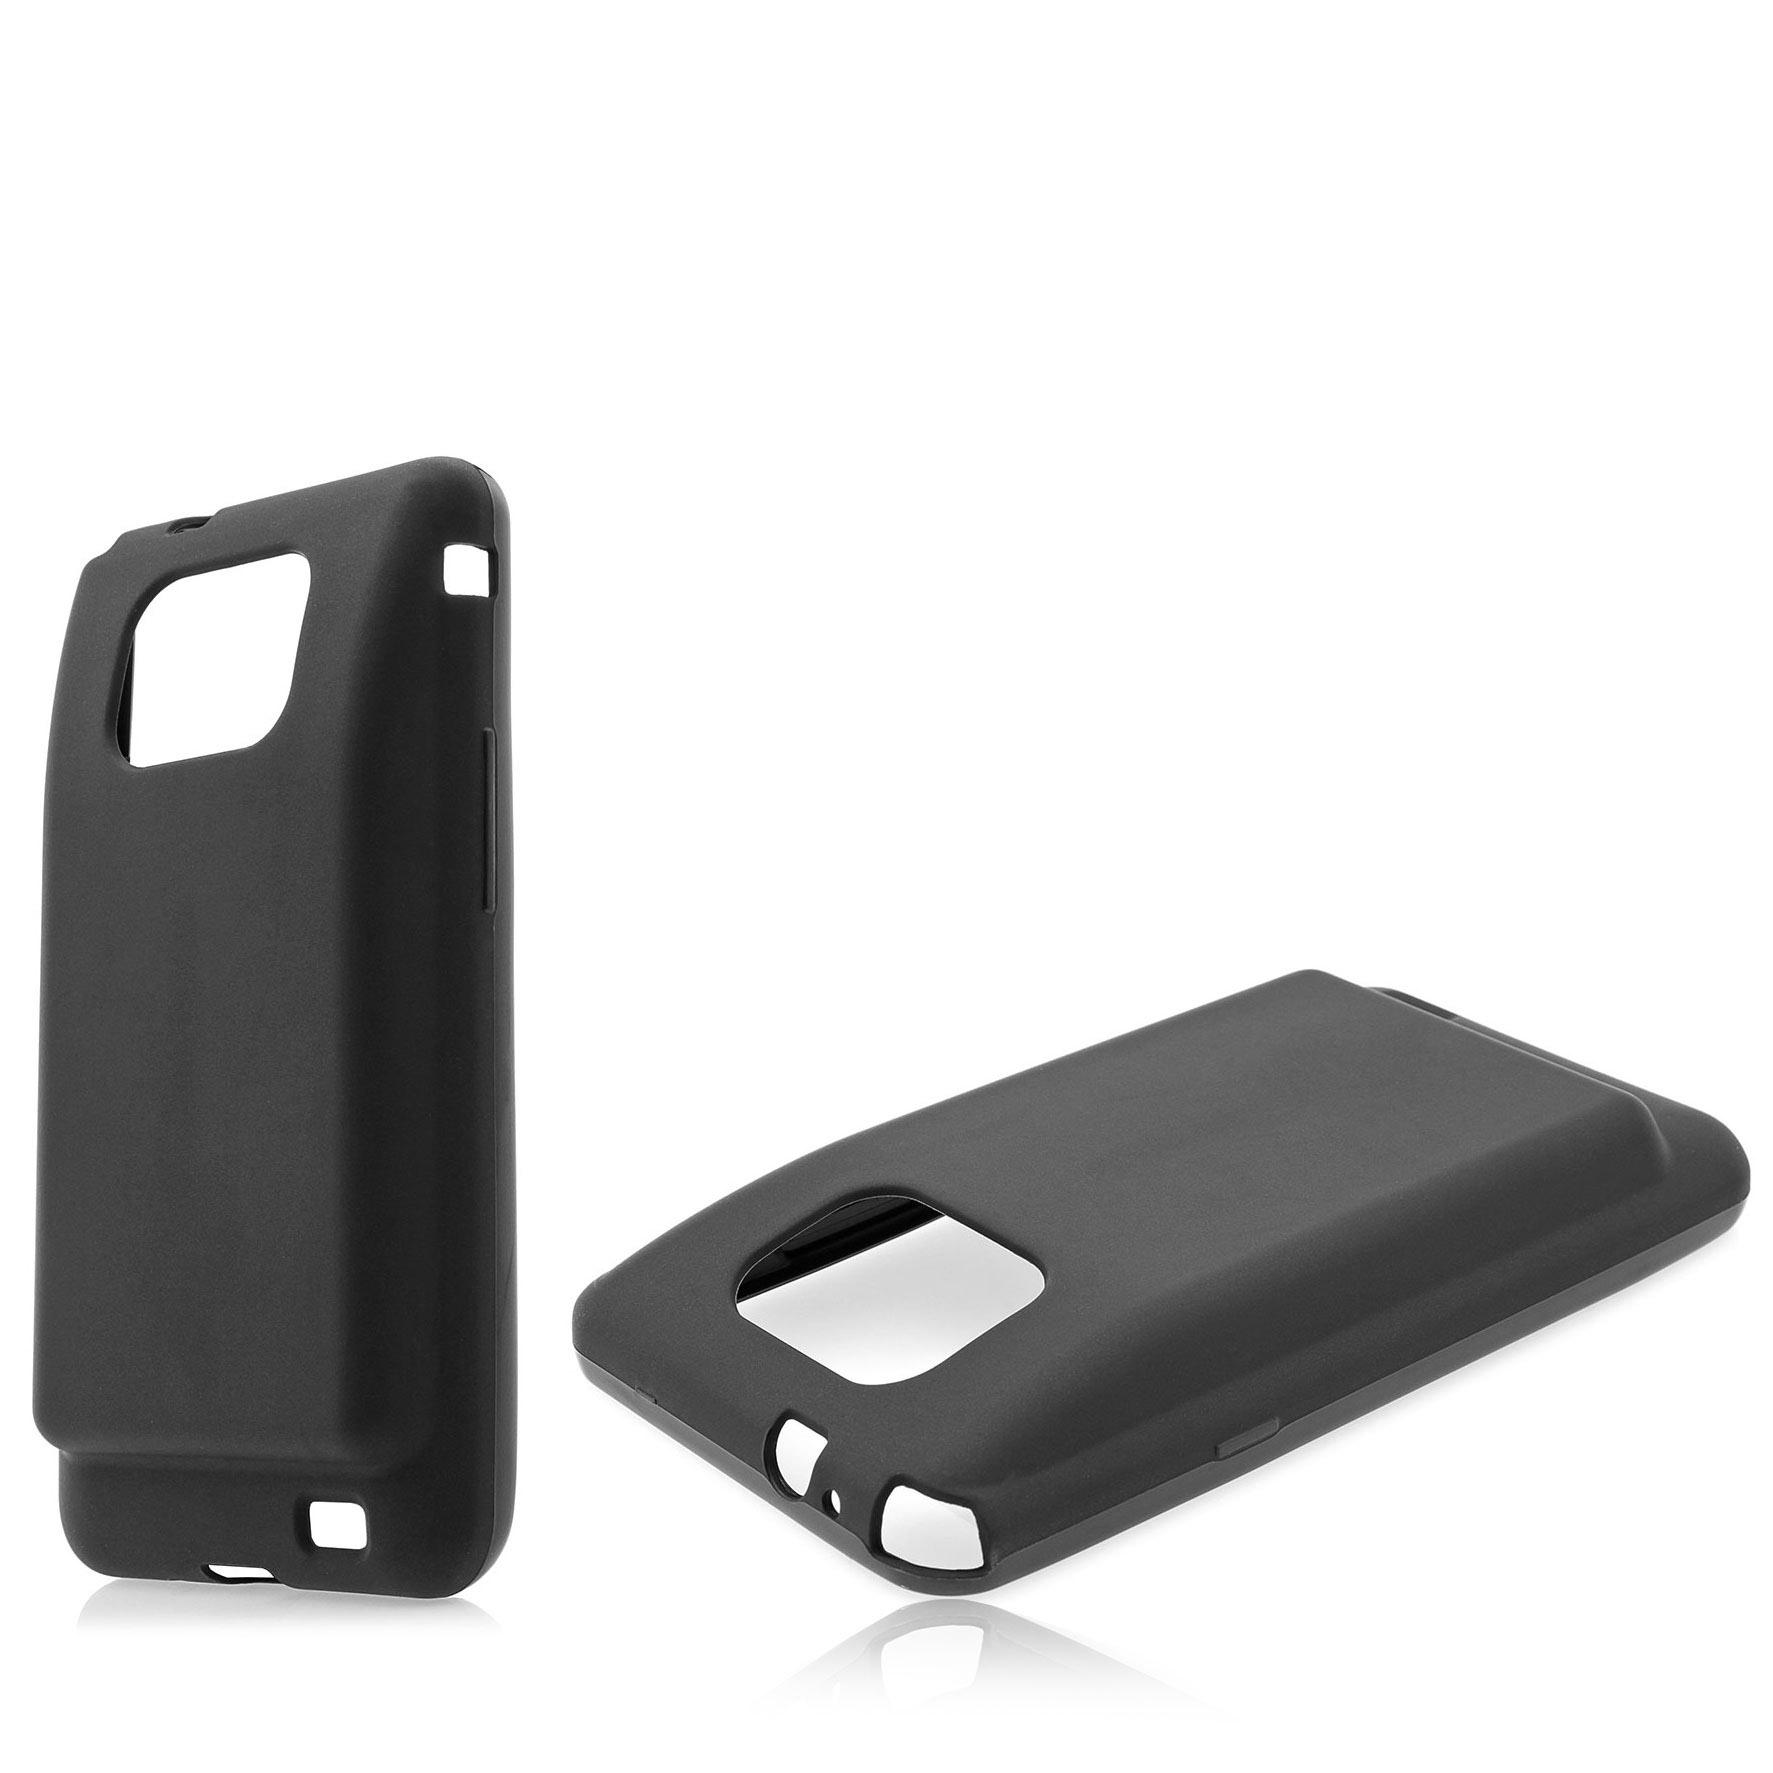 Samsung-Galaxy-S2-i9100-Backcover-fuer-Power-Akku-Deckel-Case-schwarz